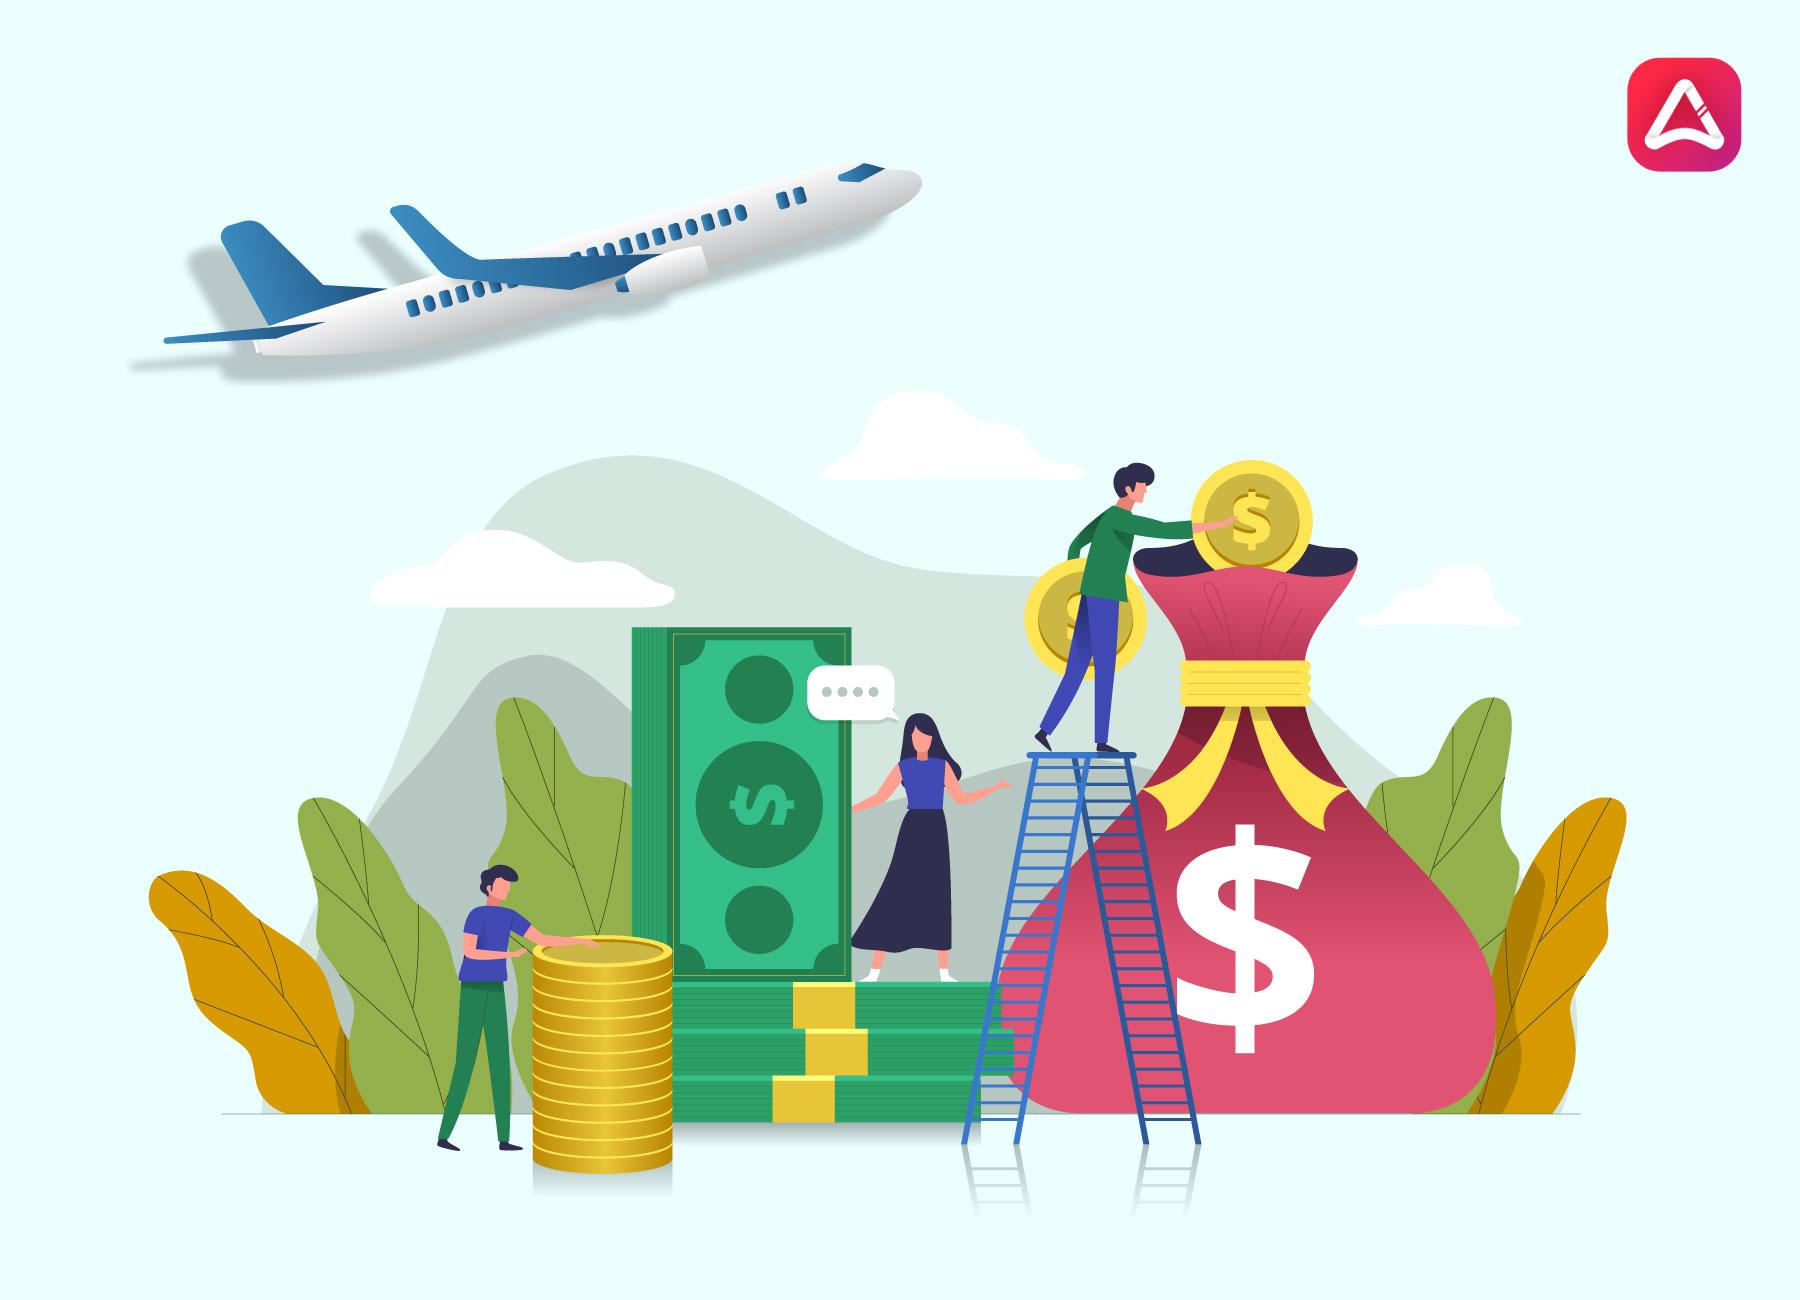 Blockchain in Aviation Industry